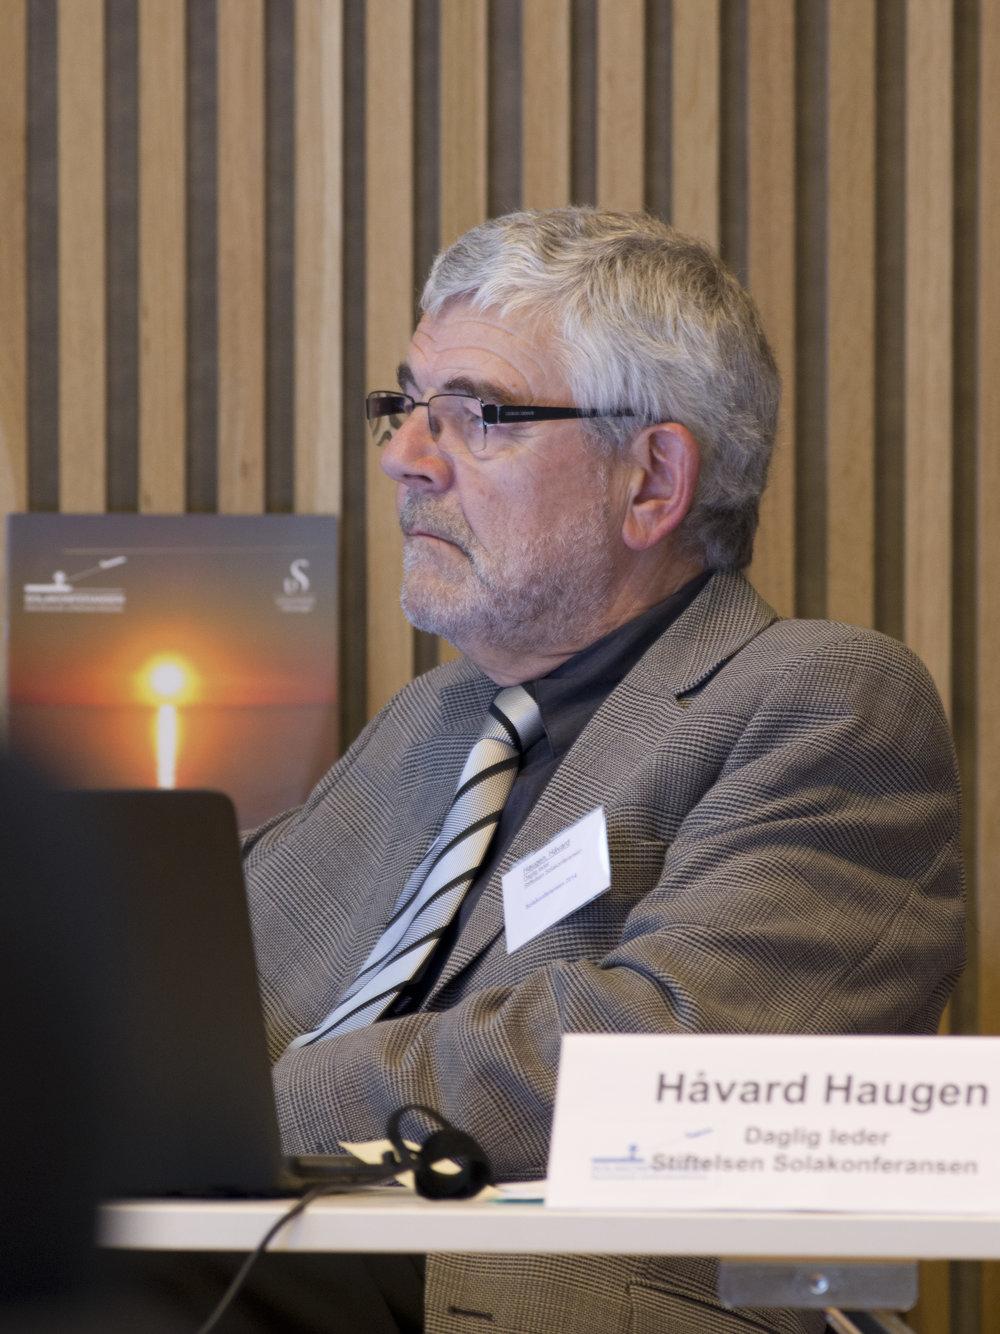 Håvard Haugen.JPG